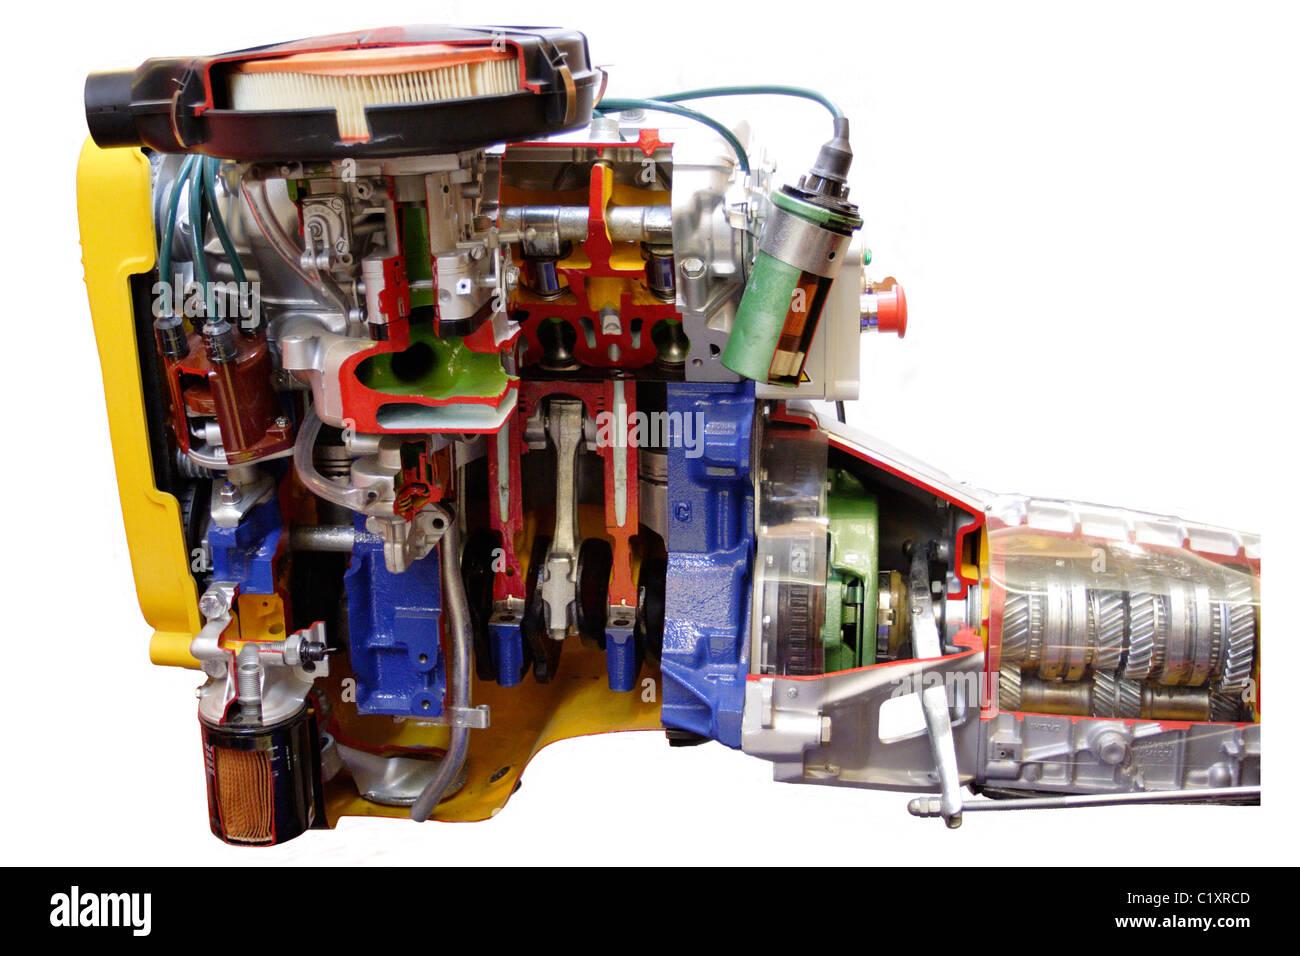 Engine Components Stockfotos & Engine Components Bilder - Alamy